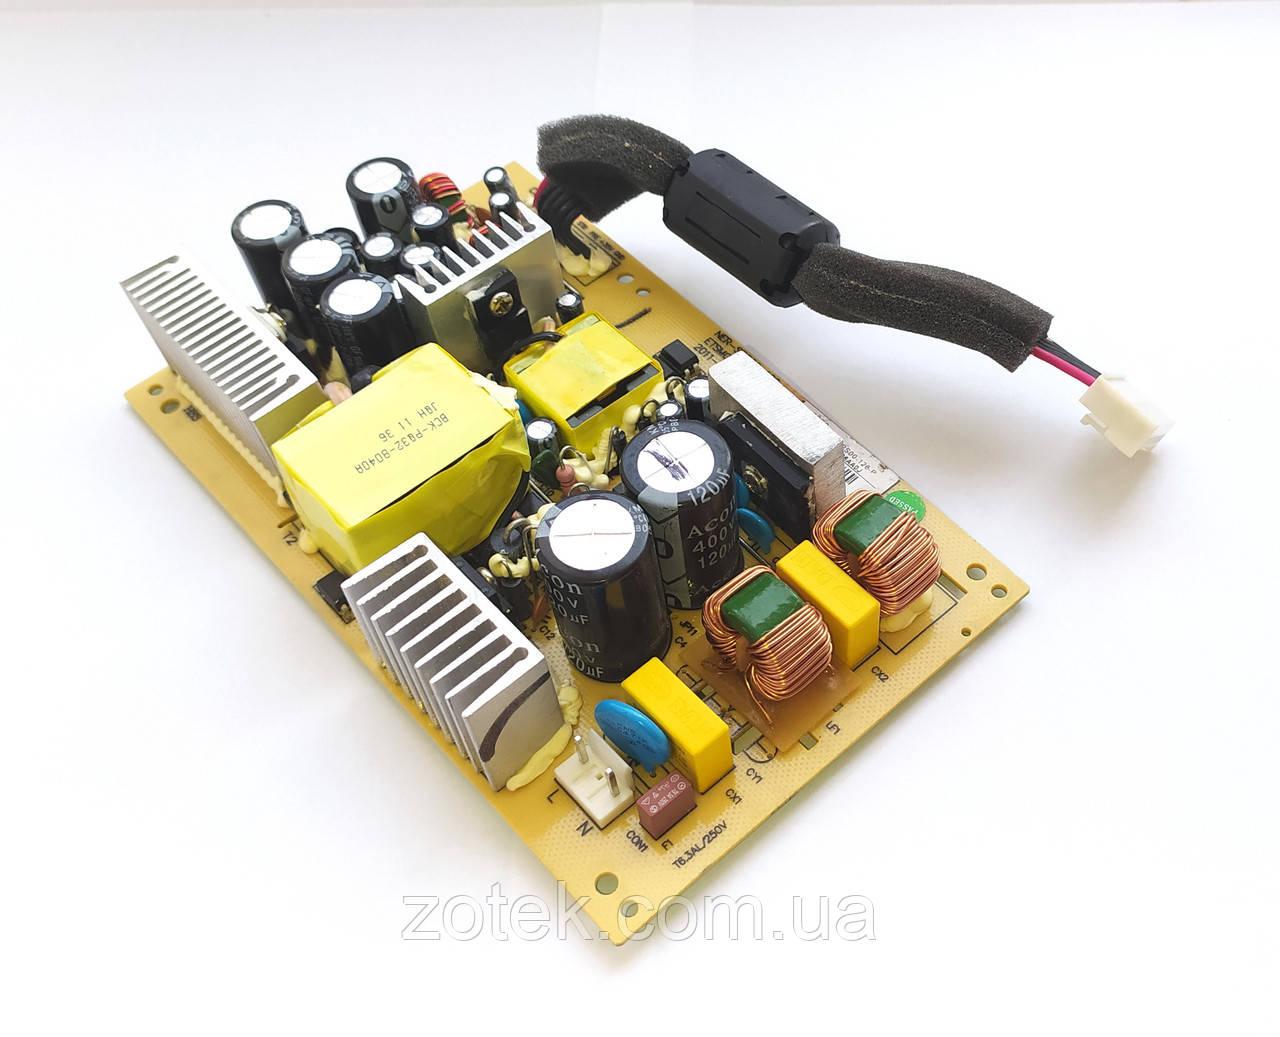 Блок живлення 35В 6А 210W NER-SPSPS00-126 AC-DC 35V 6A 220 Вольт